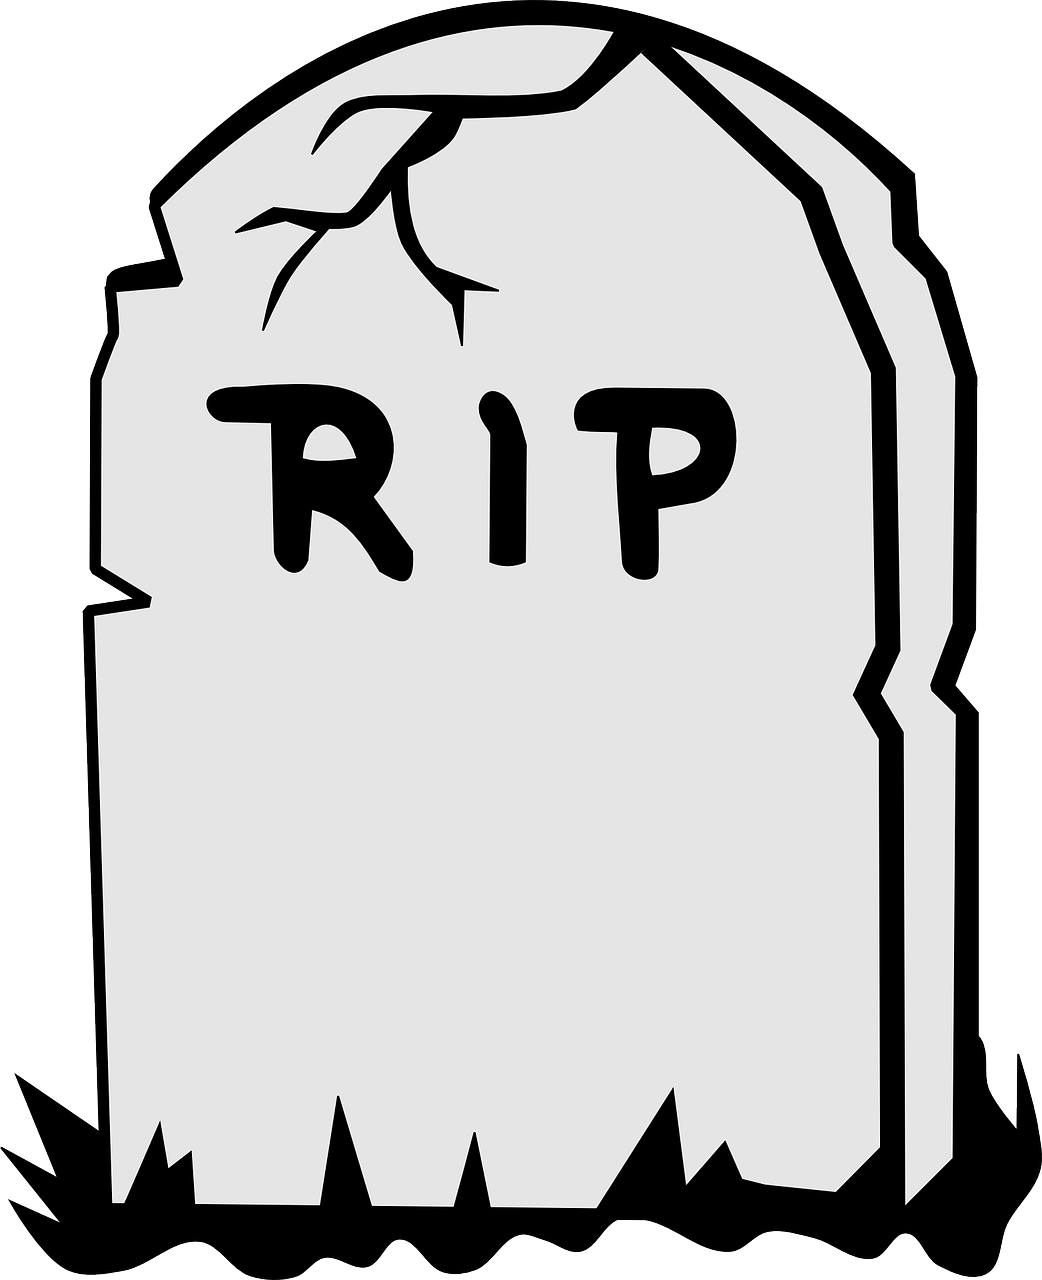 graphic black and white stock Goodbye clipart september. Blog rachael o phillips